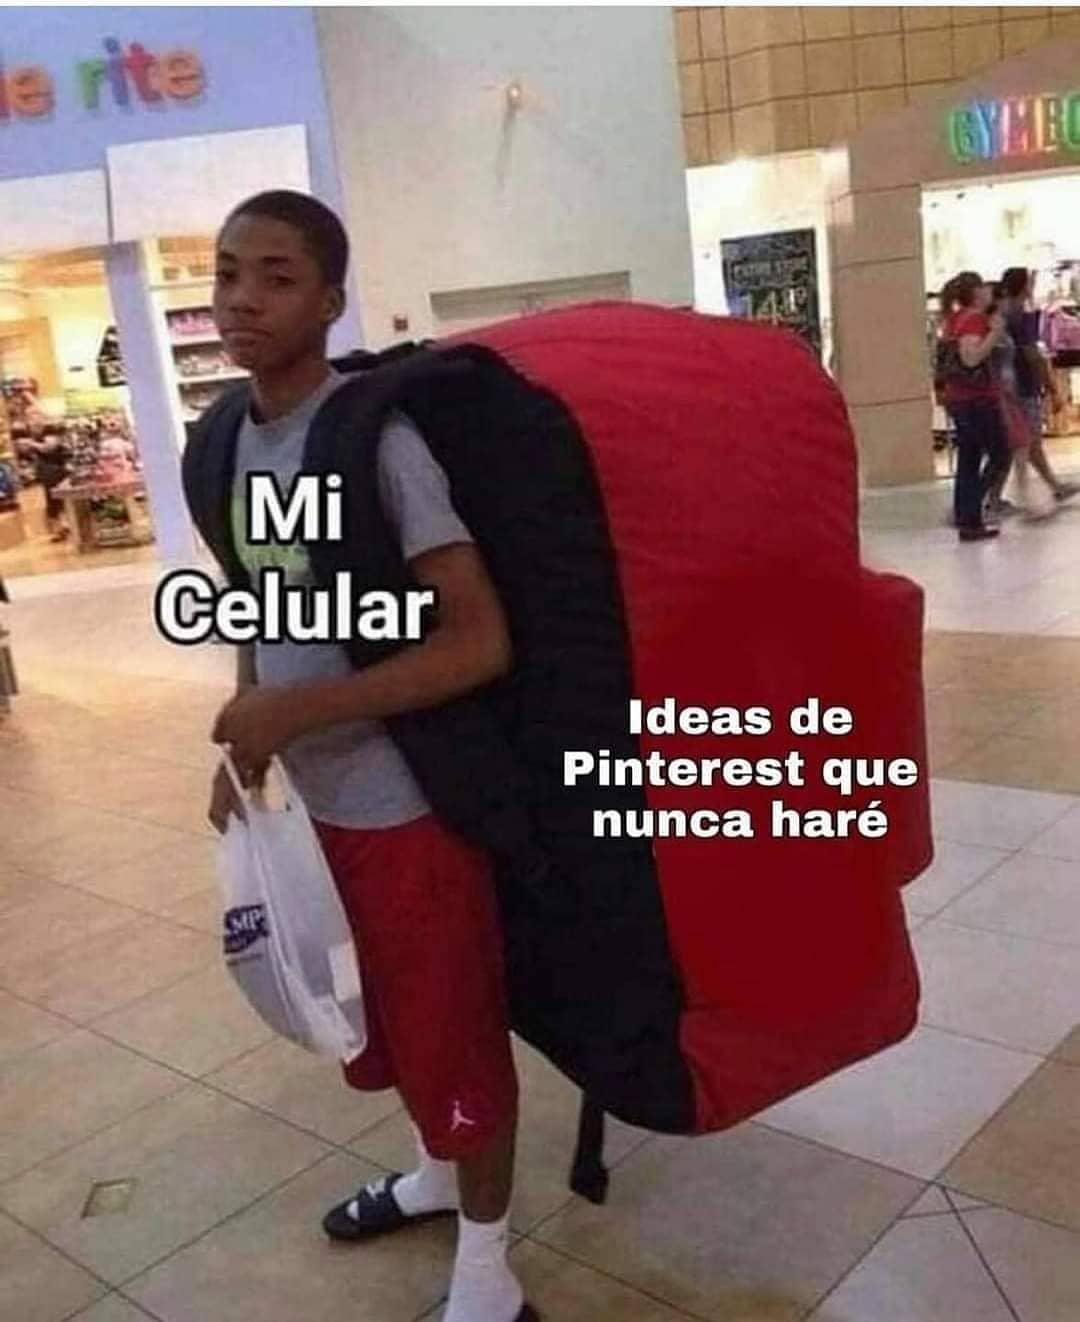 Mi celular. Ideas de Pinterest que nunca haré.